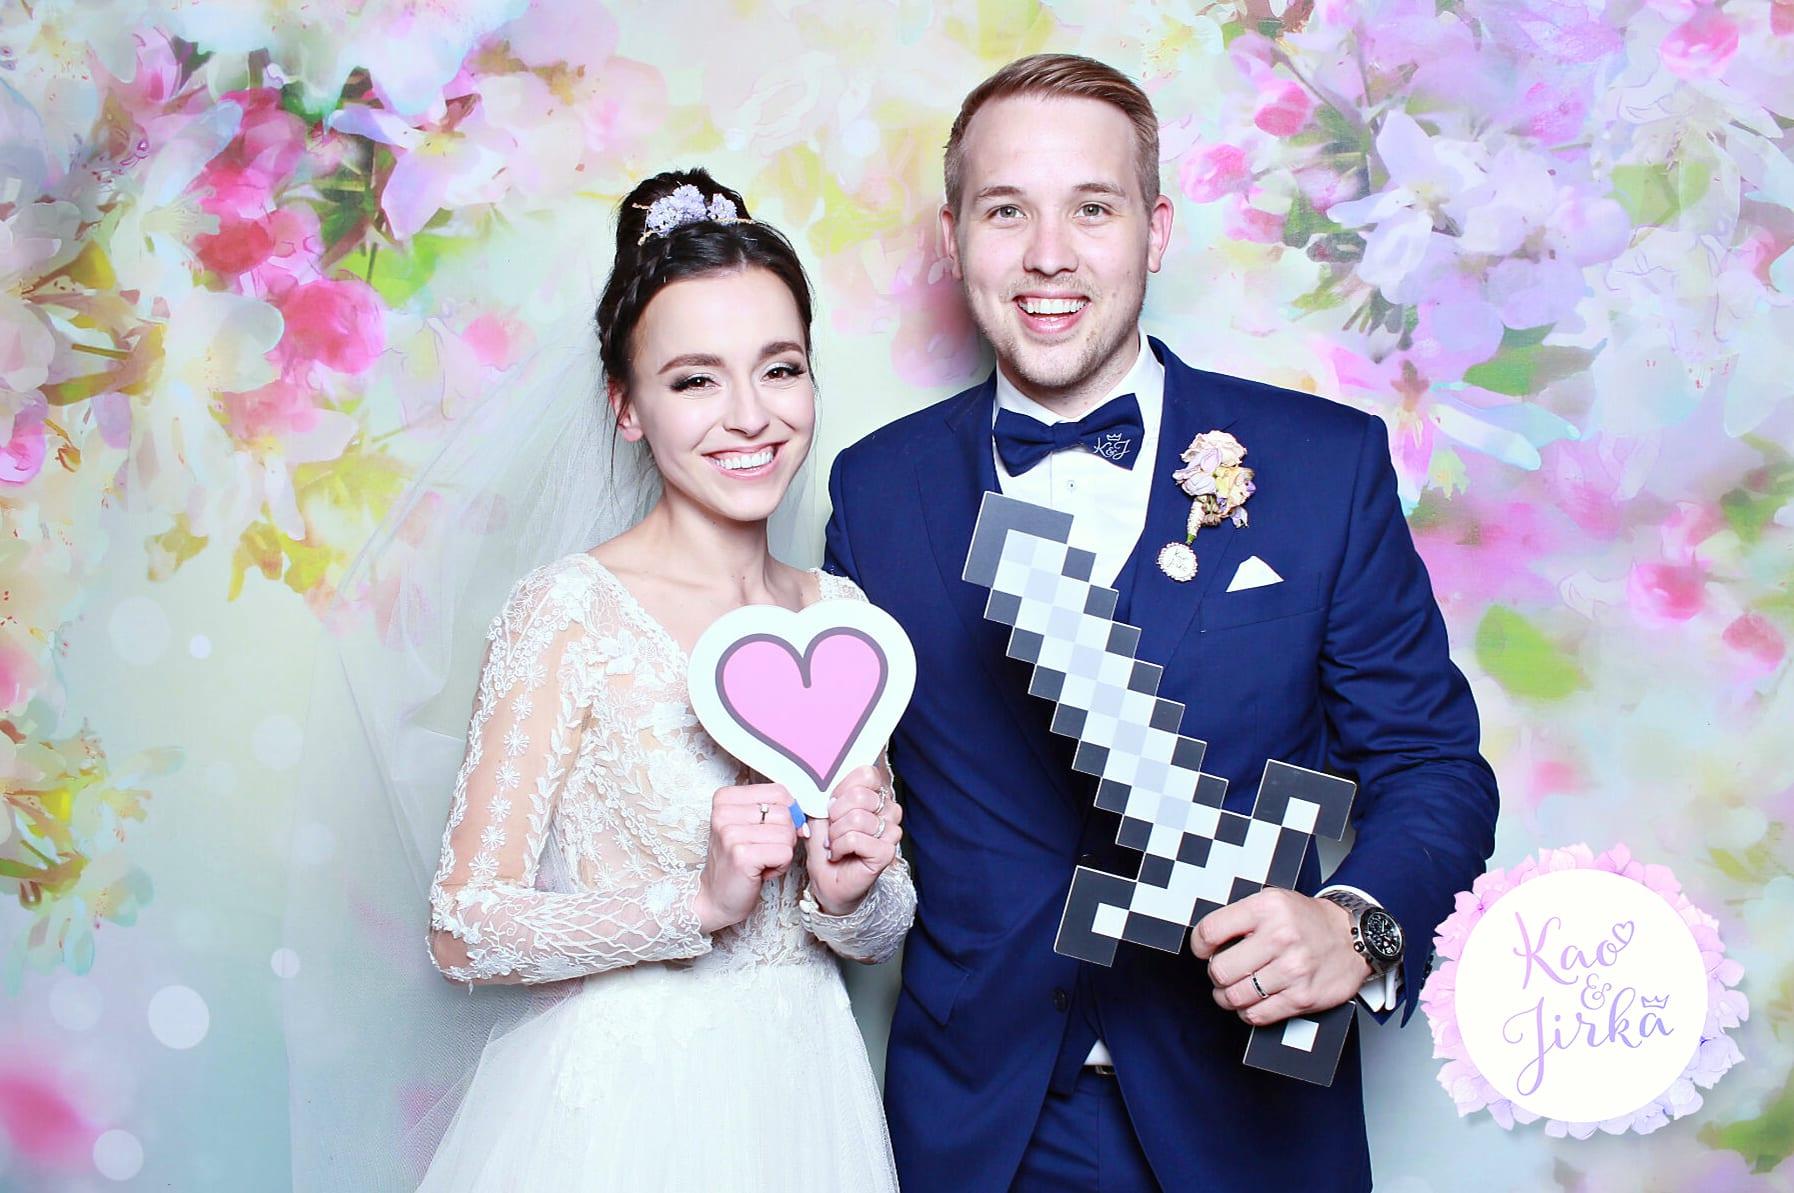 fotokoutek-praha-svatba-kao-jirka-729186